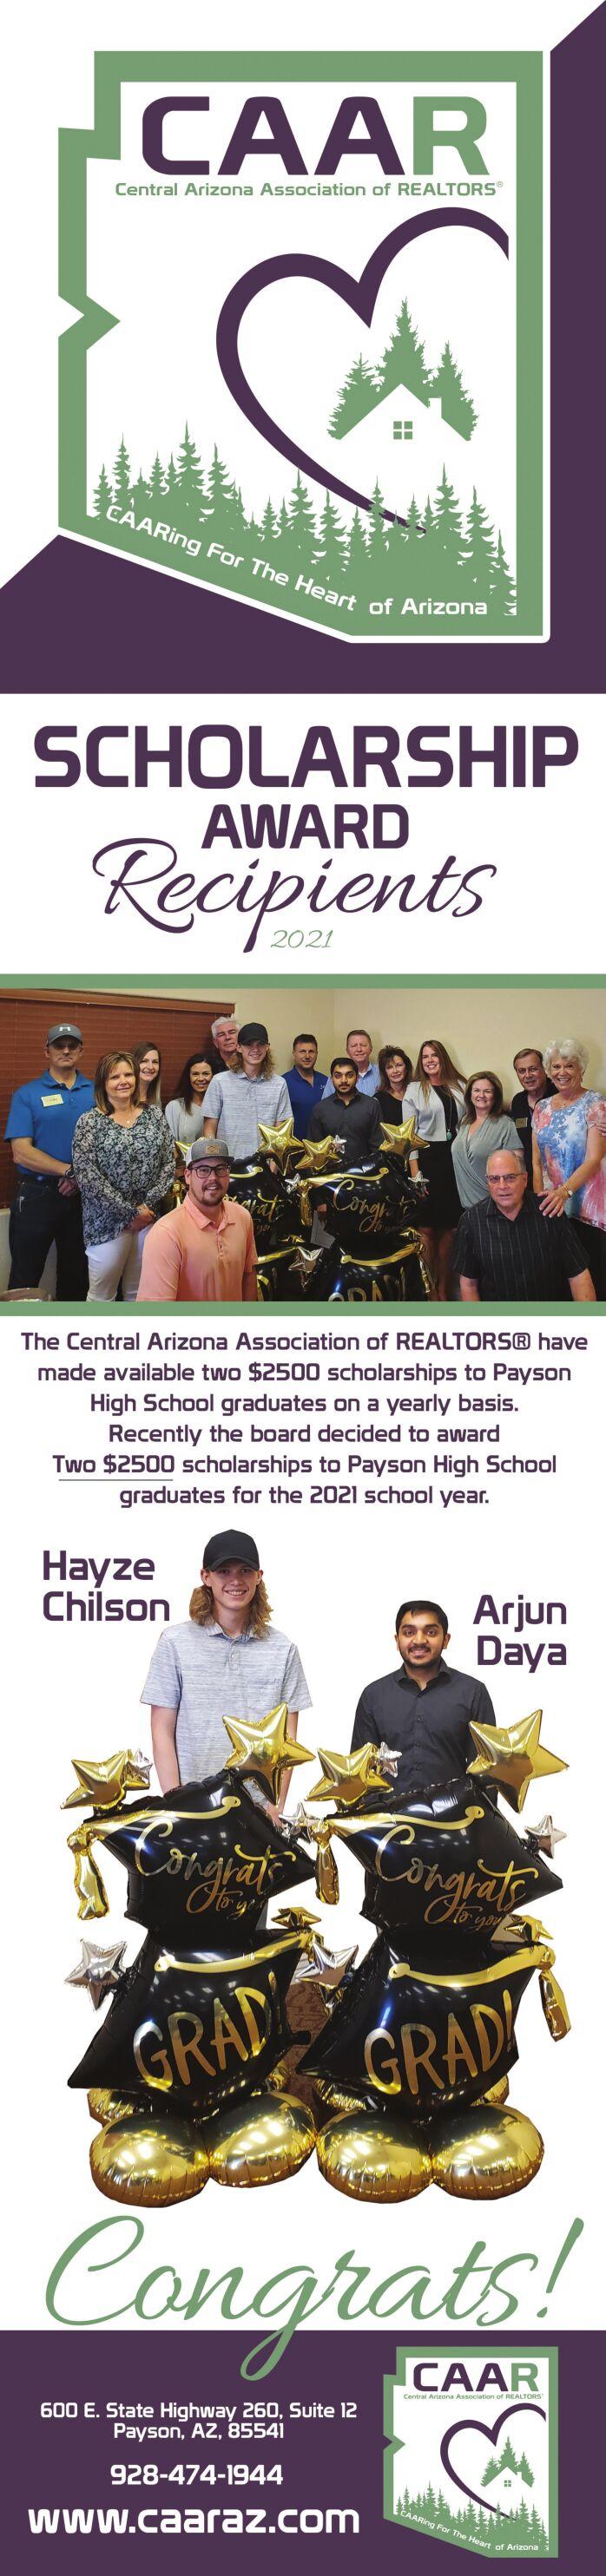 CAAR Scholarship Award Recipients